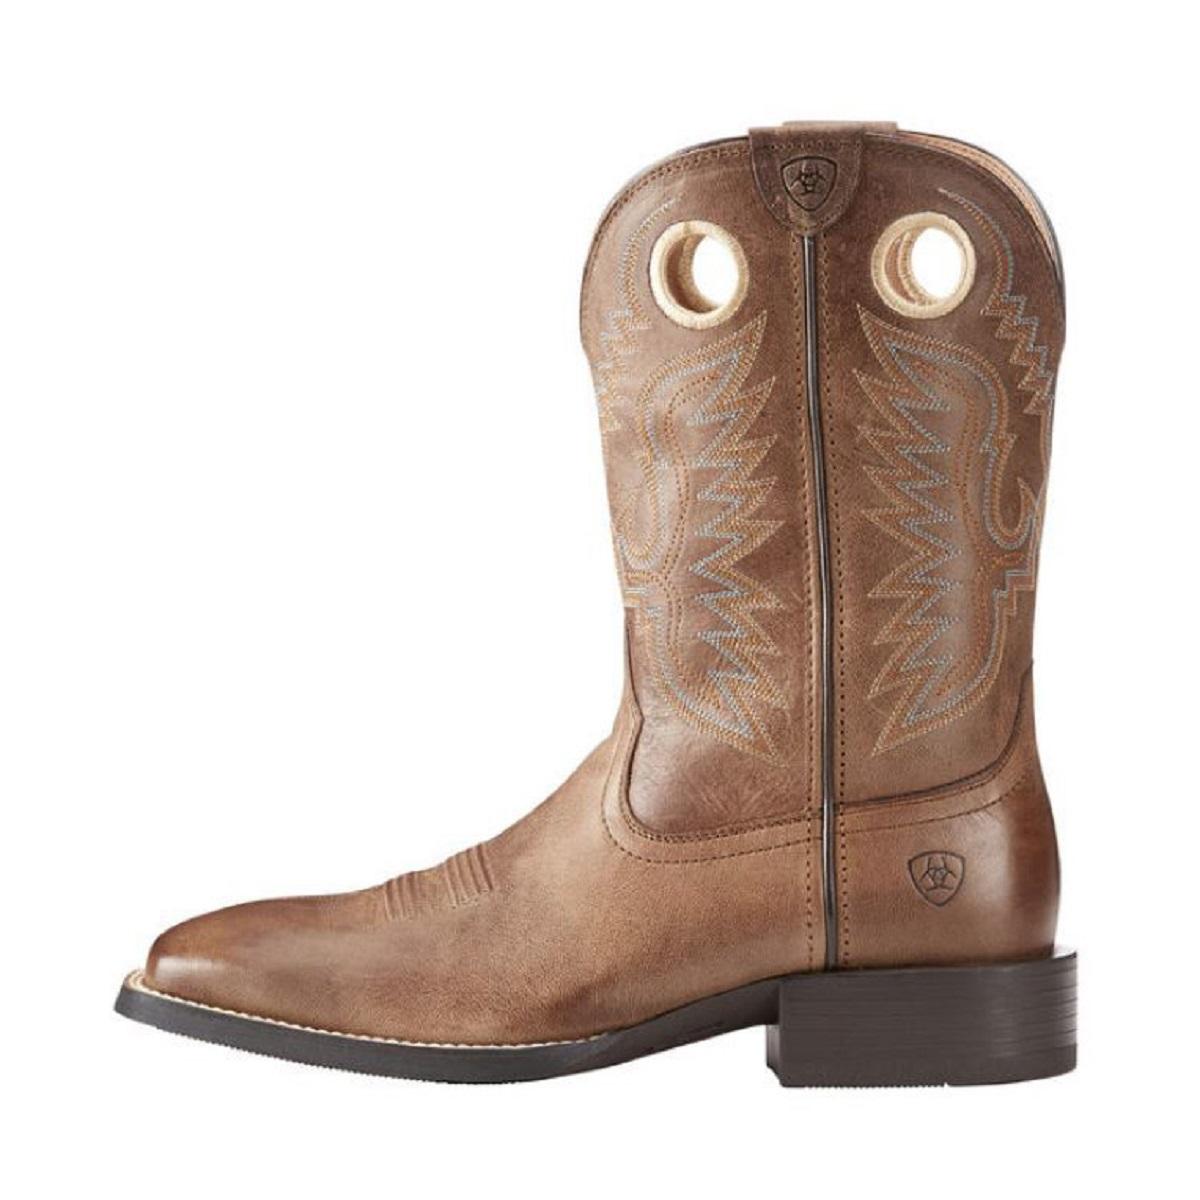 80583c32033 Mens Western Boot Ariat Sport Ranger 10023196